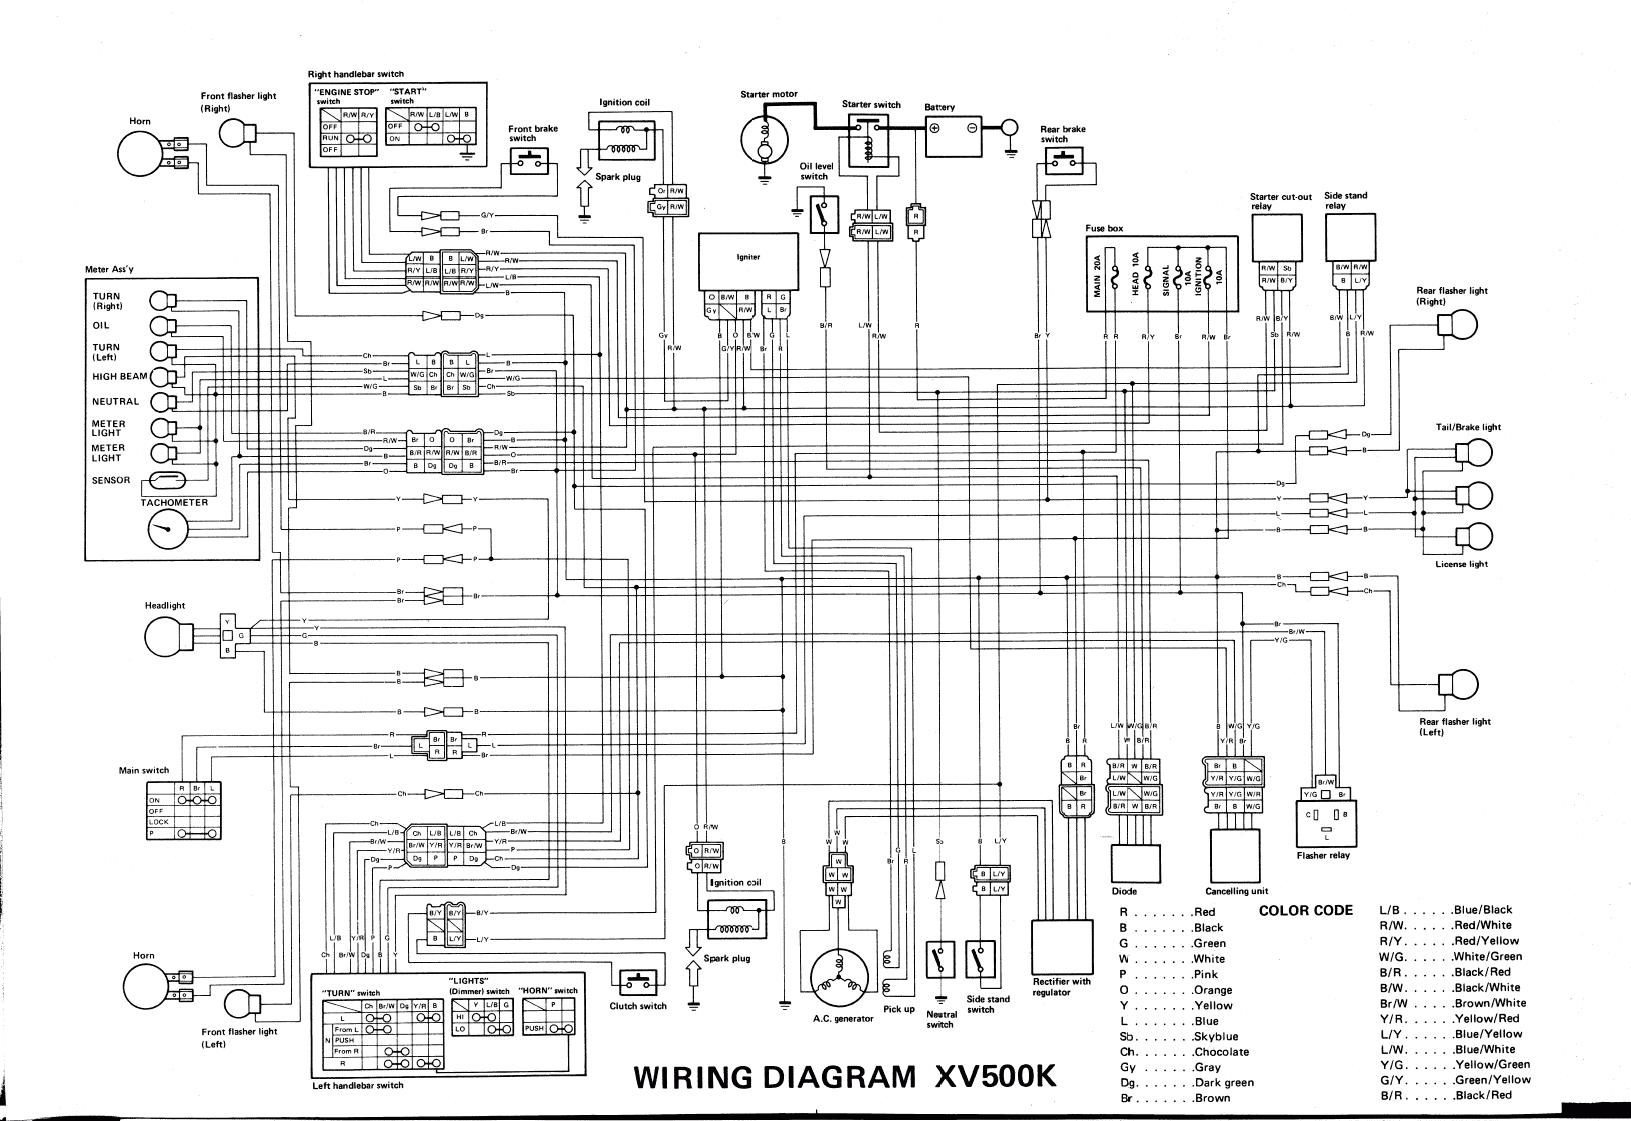 Yamaha xv1100 virago wiring diagram new wiring diagram 2018 beautiful yamaha 1100 wiring diagram ideas electrical and wiring 1996 yamaha virago wiring diagram yamaha tt500 wiring diagram yamaha grizzly wiring diagram pooptronica